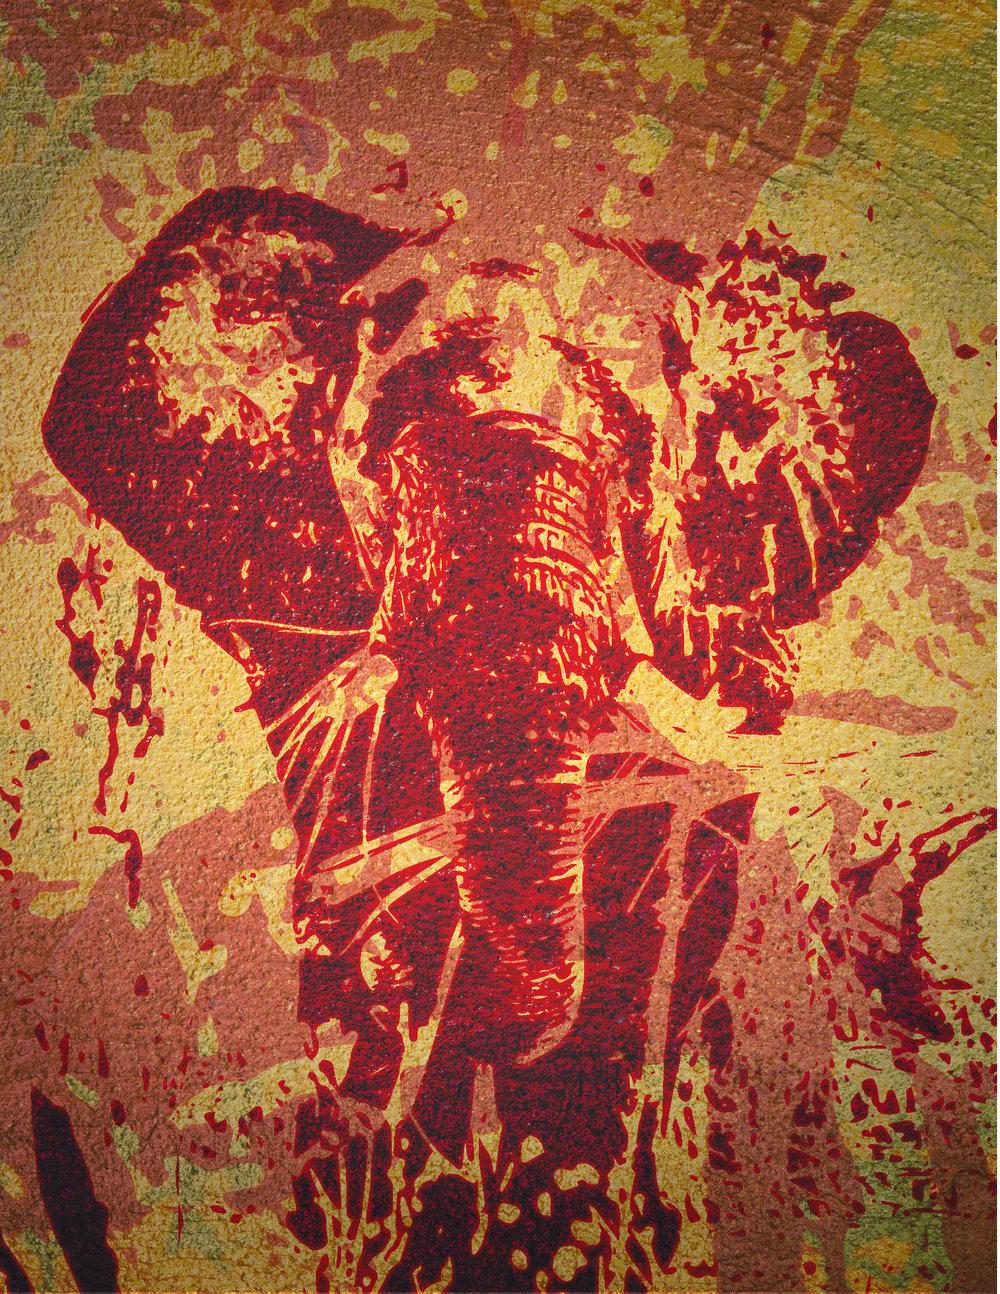 Elephant_Day3-01.jpg